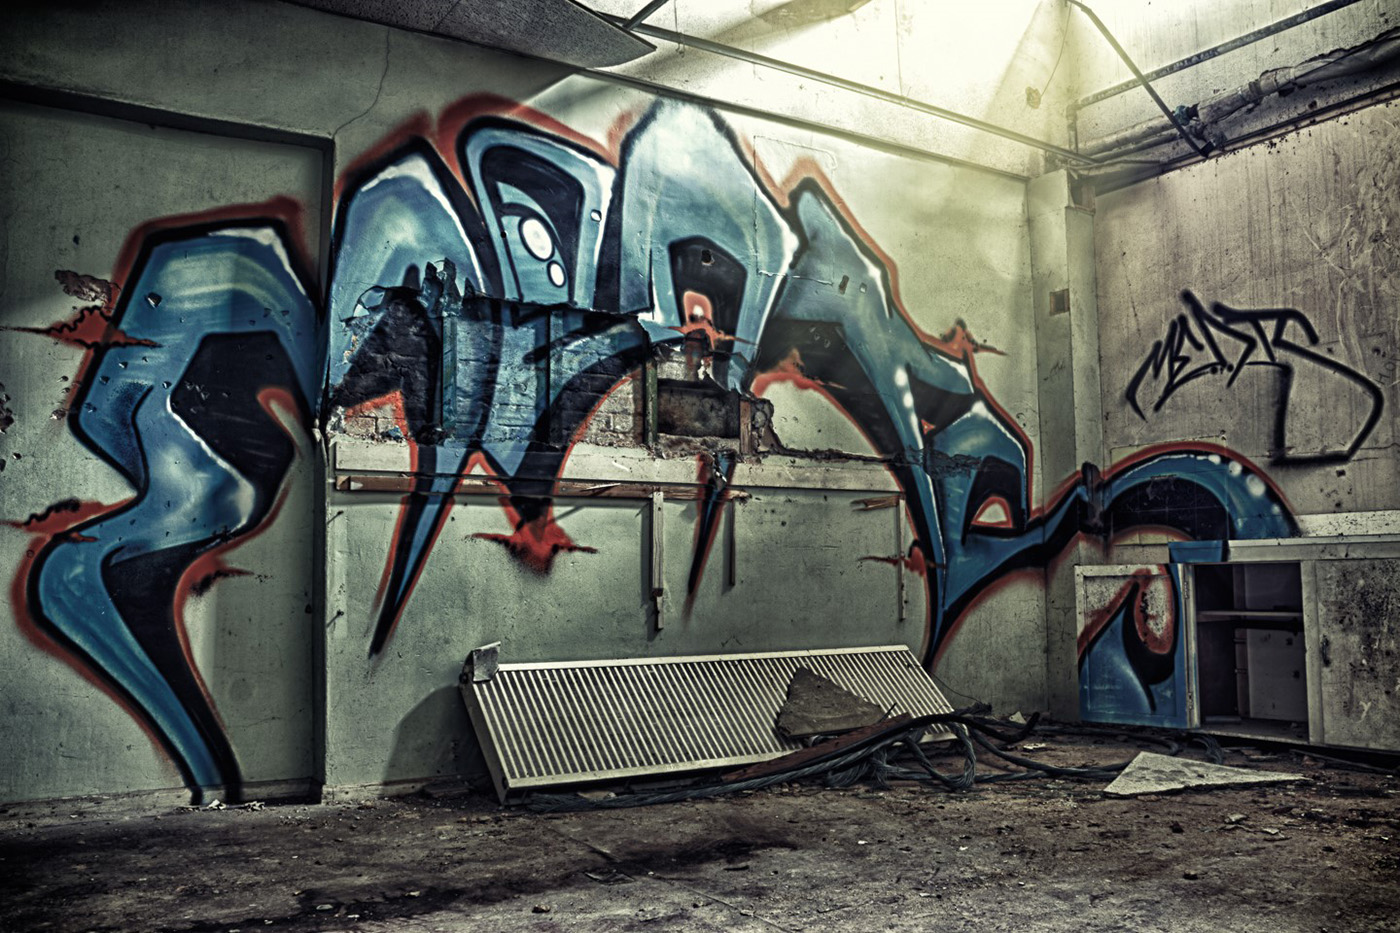 Heckingham Graffiti